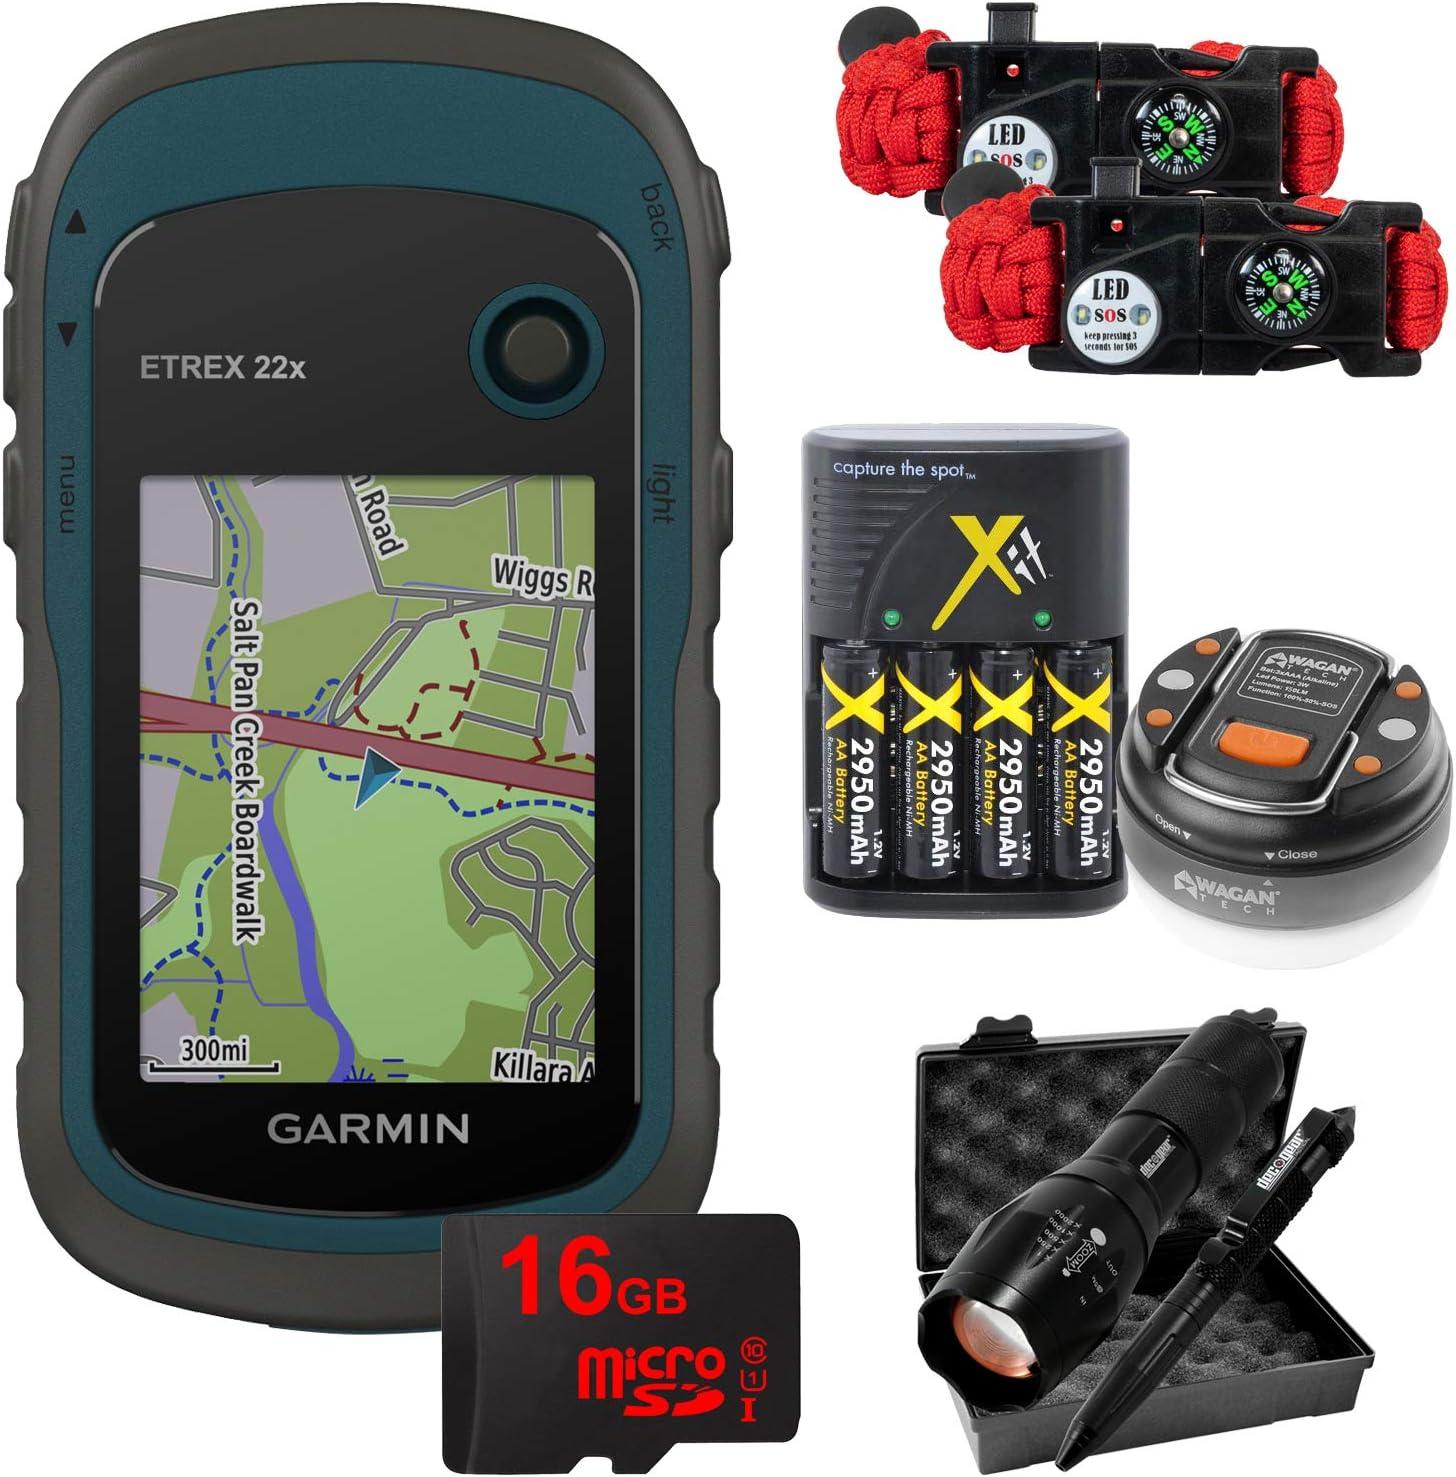 Garmin eTrex 22x: Rugged Handheld 2021 with Camping 16GB Save money GPS Hiking